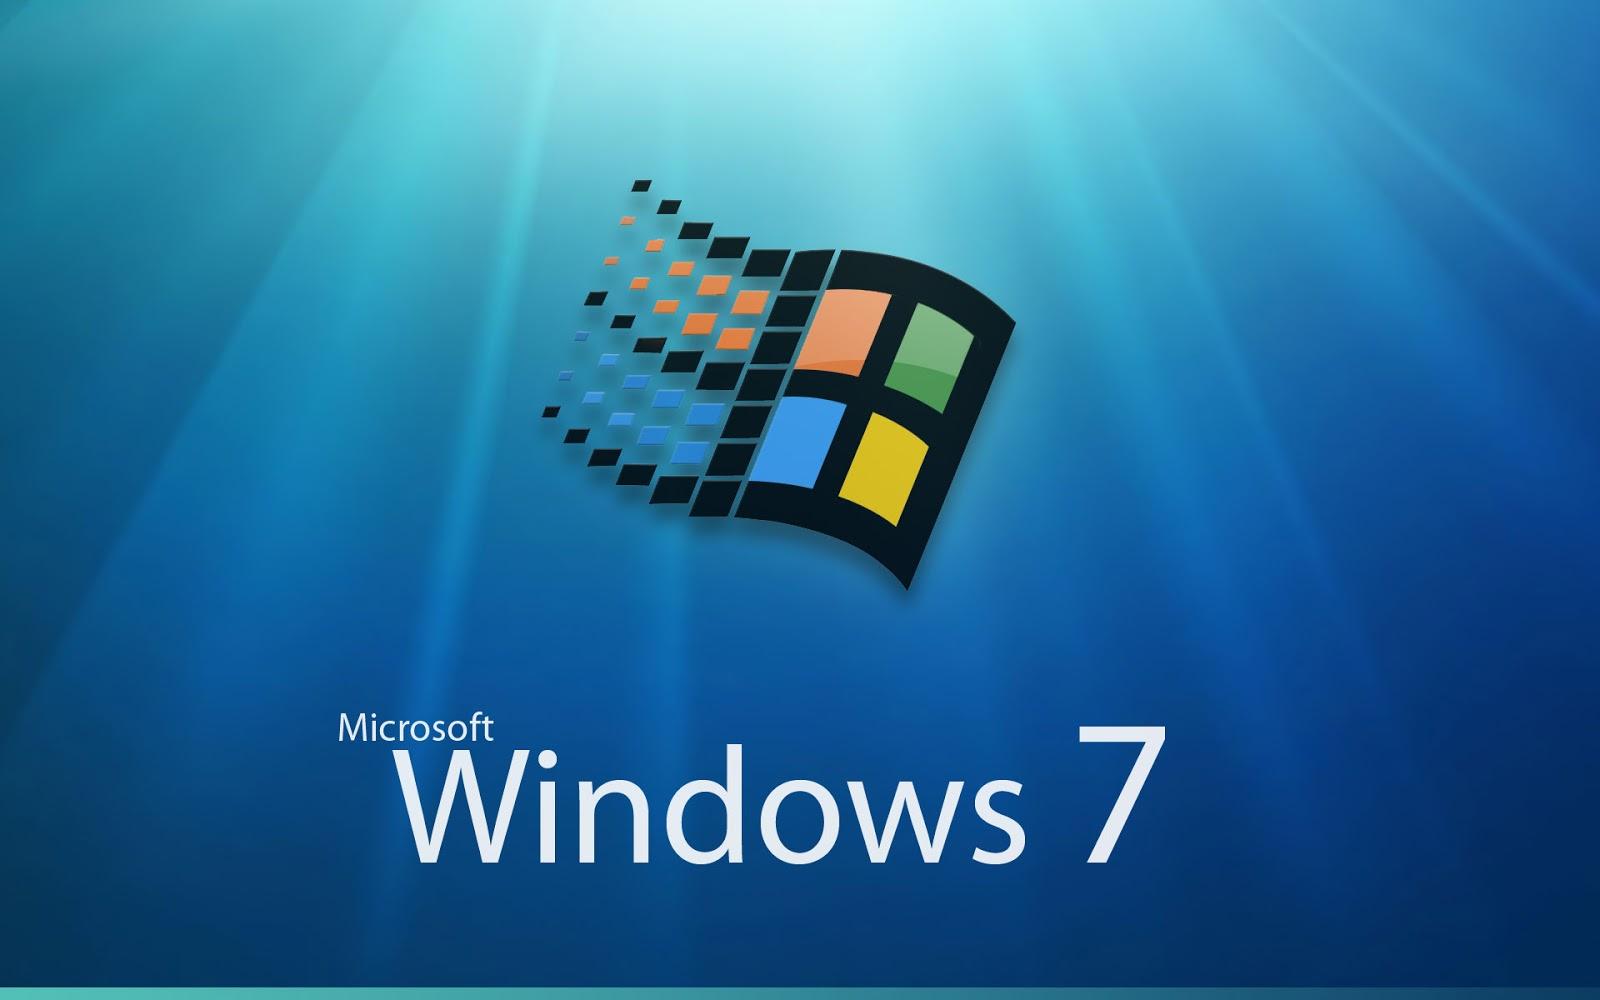 Cara Install Ulang Windows 7 LengkapGambar Belajar Komputer. Cara ...